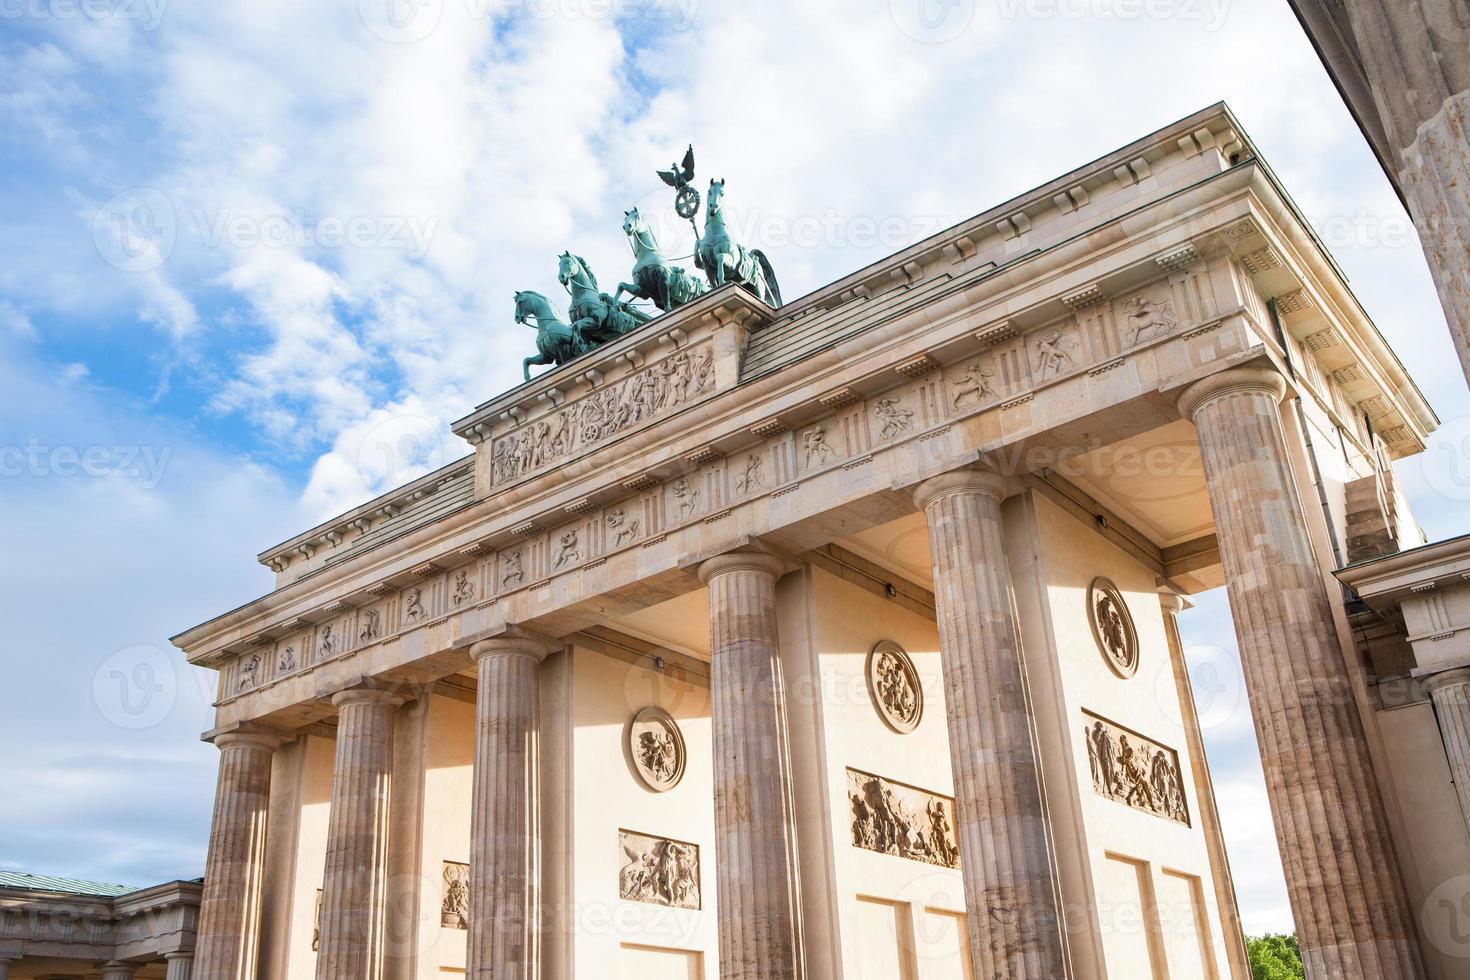 Brandenburg gate in Berlin photo